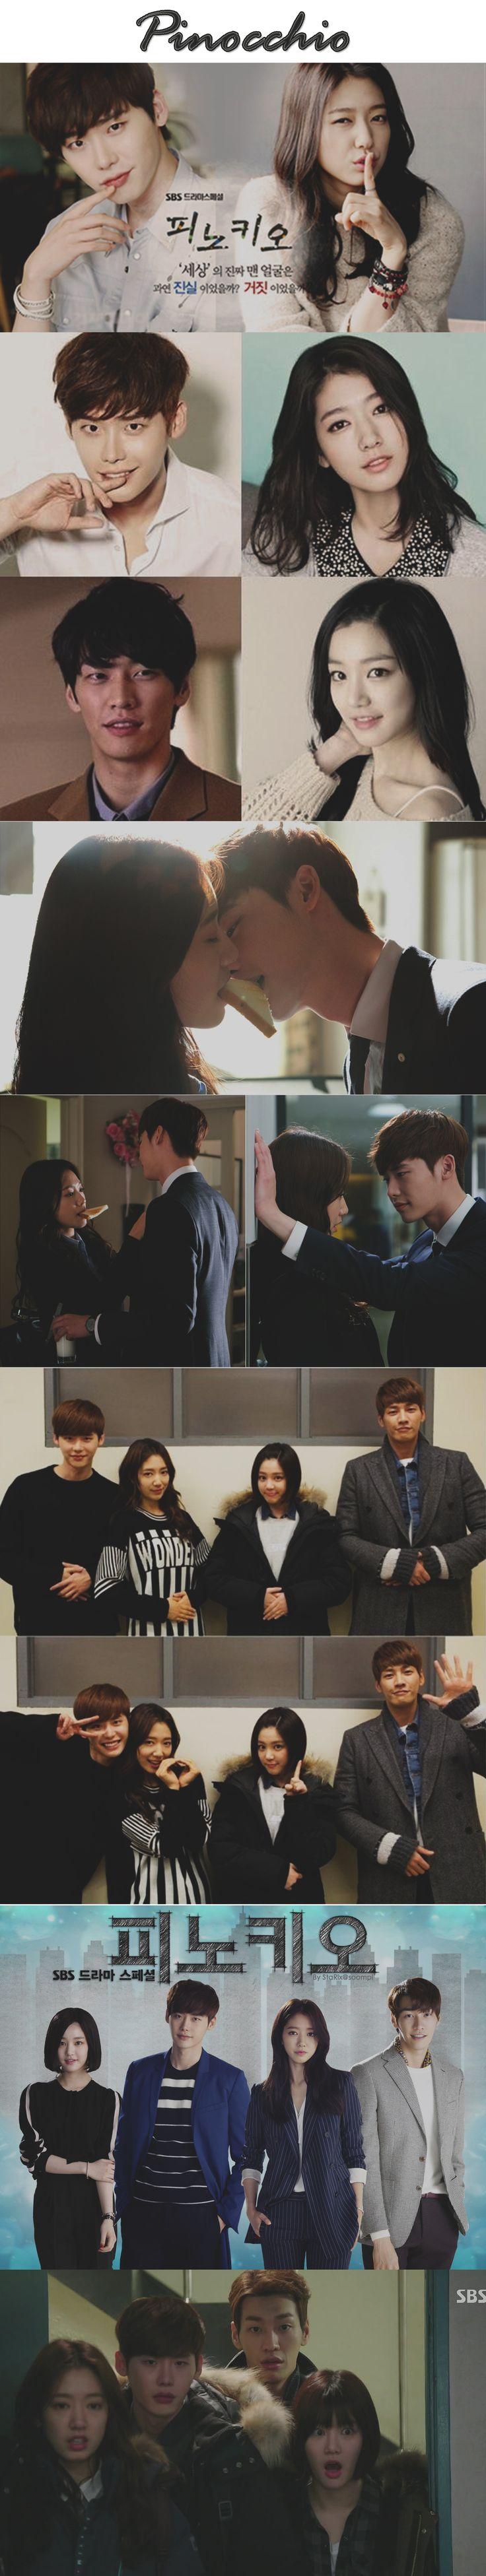 Pinocchio ( 피노키오 ) kdrama 2015 - 20 episodes - Lee Jong-Suk  / Park Shin-Hye / Kim Young-Kwang / Lee Yoo-Bi / Lee Pil-Mo by Luciane Miyuki Sakakima